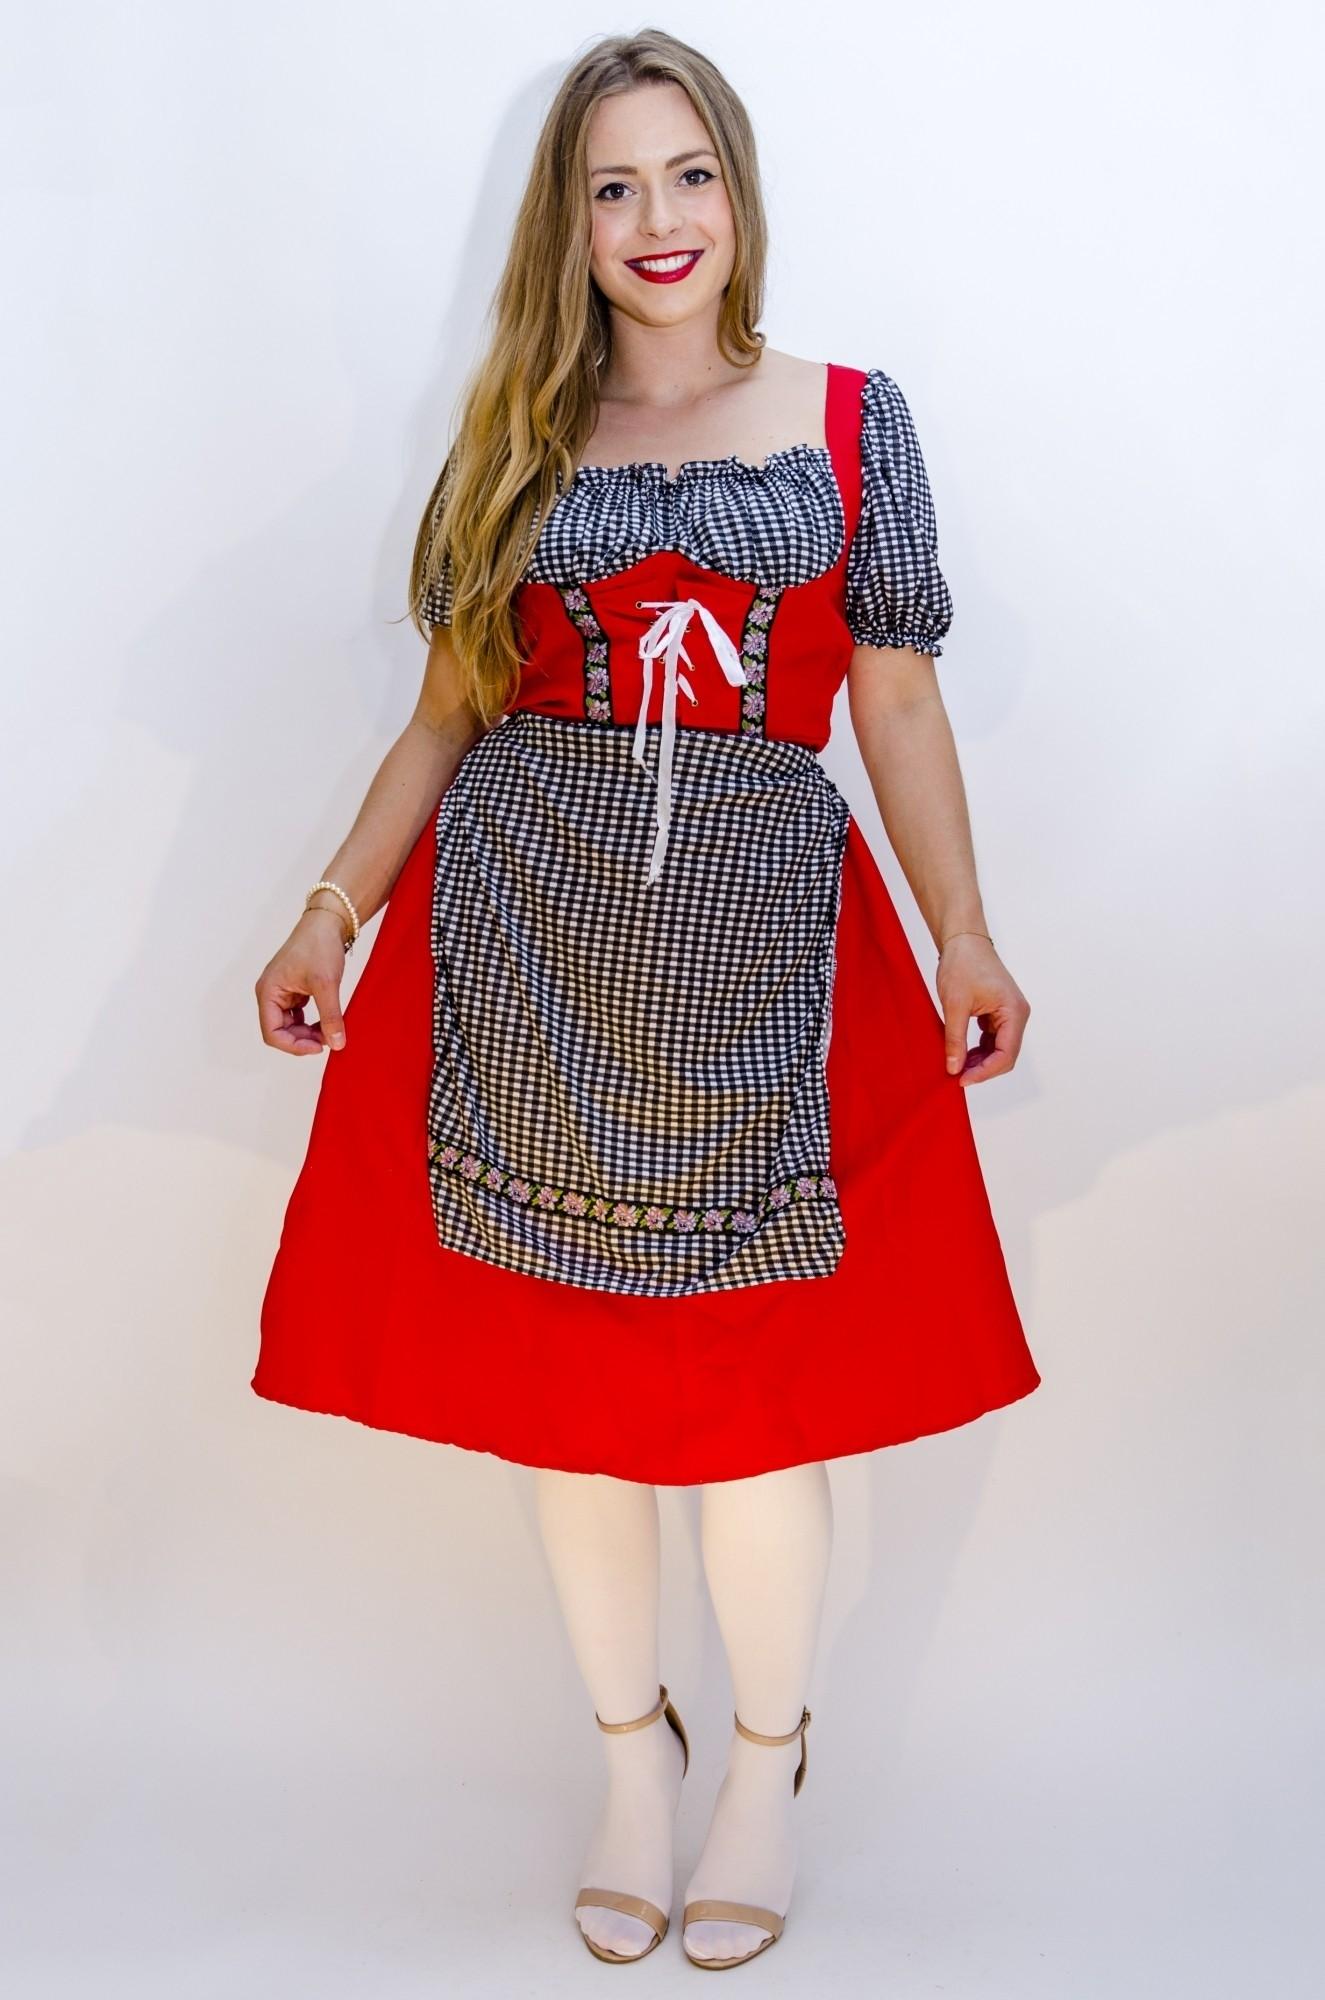 dacc63ea5abf49 Tiroler jurk Karin - Confettifeest.nl